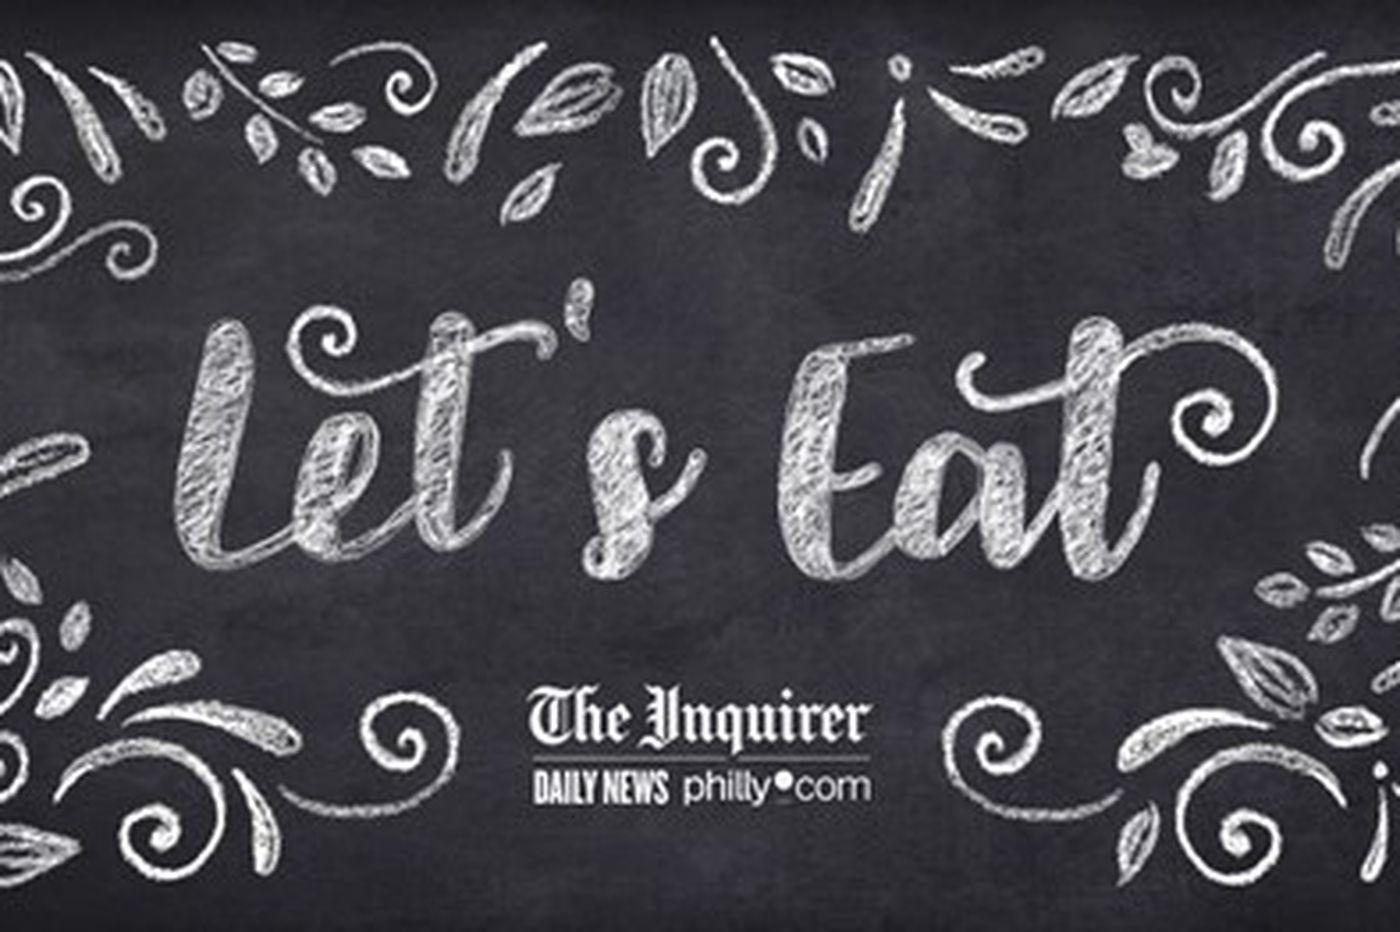 Let's Eat: Arancini and tagliatelle at a corner bar?